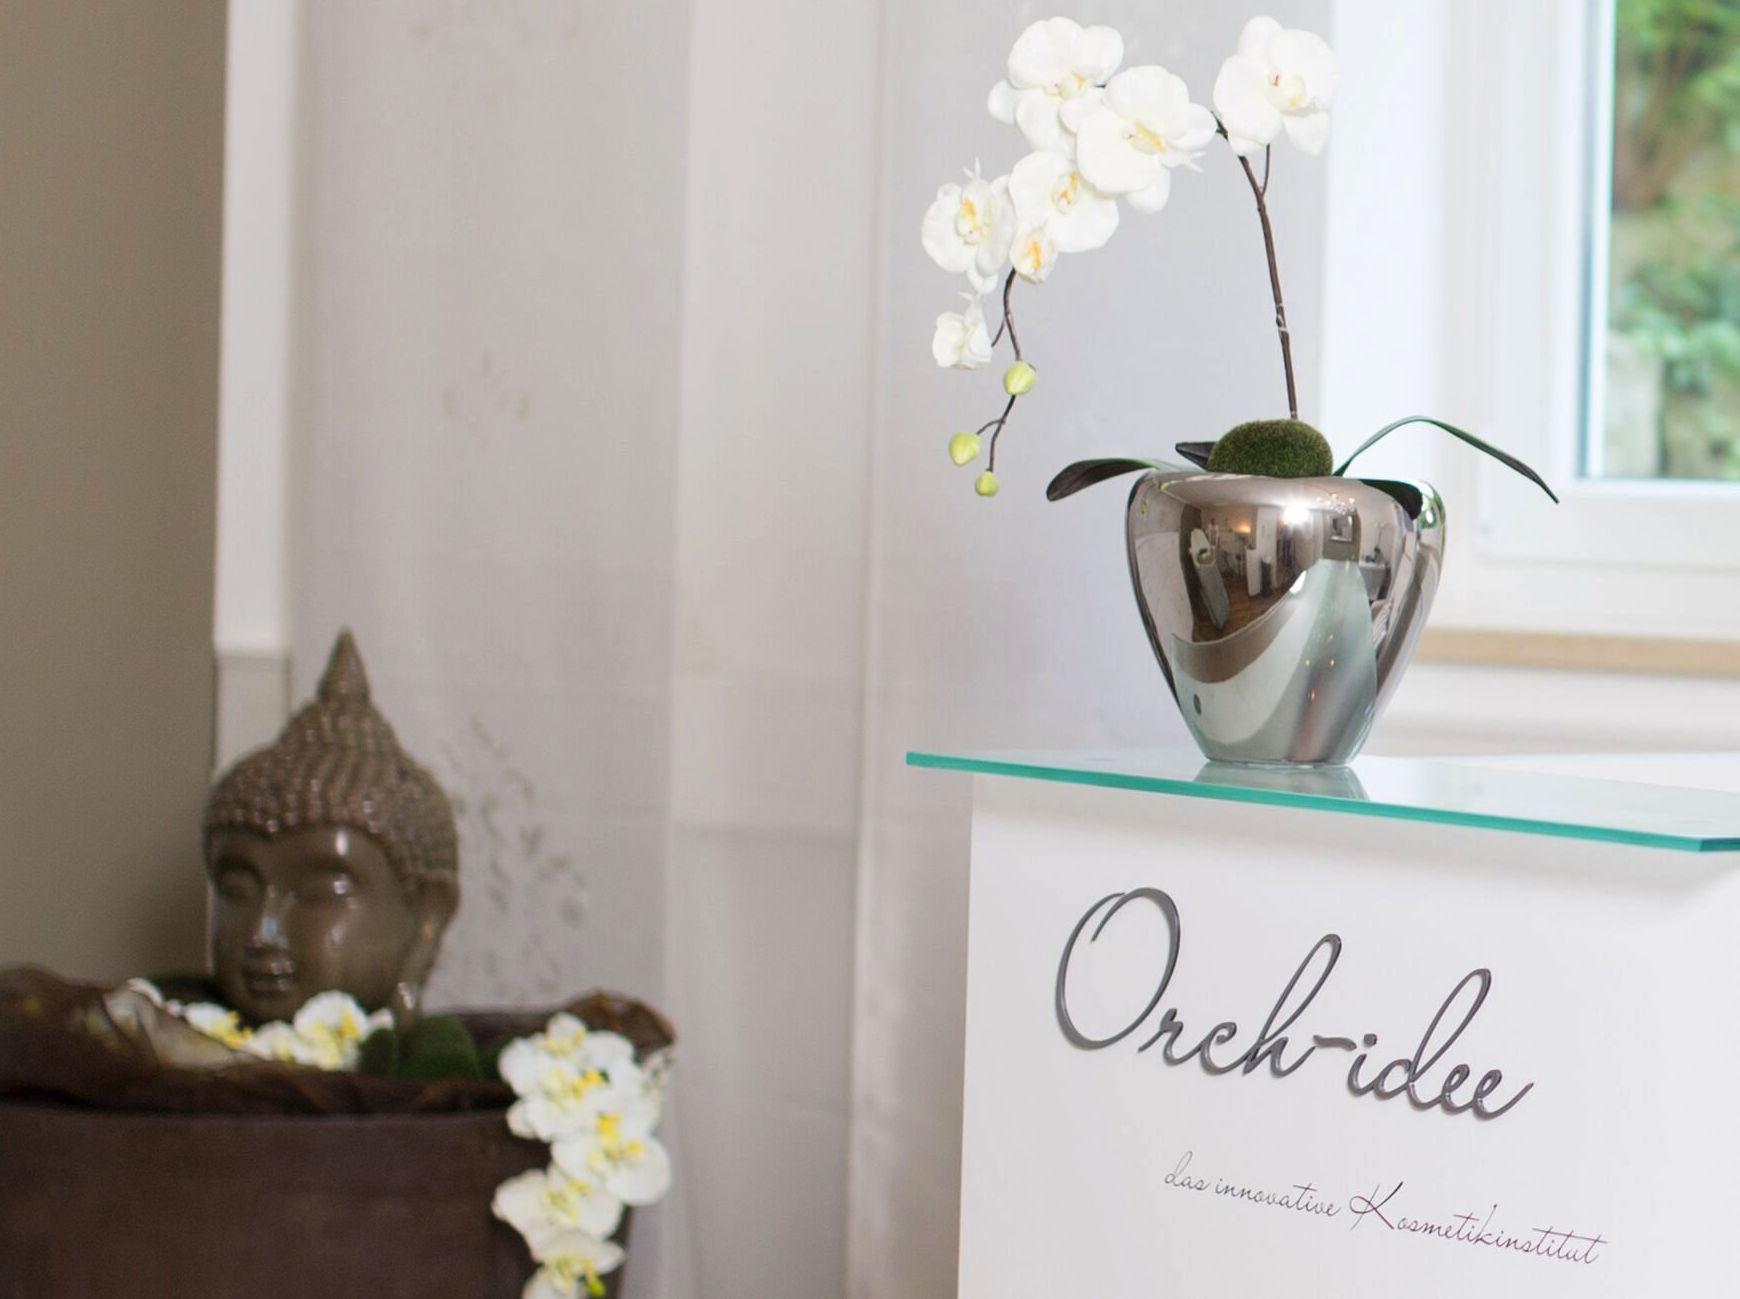 2016-06-25_My_Orchidee-2